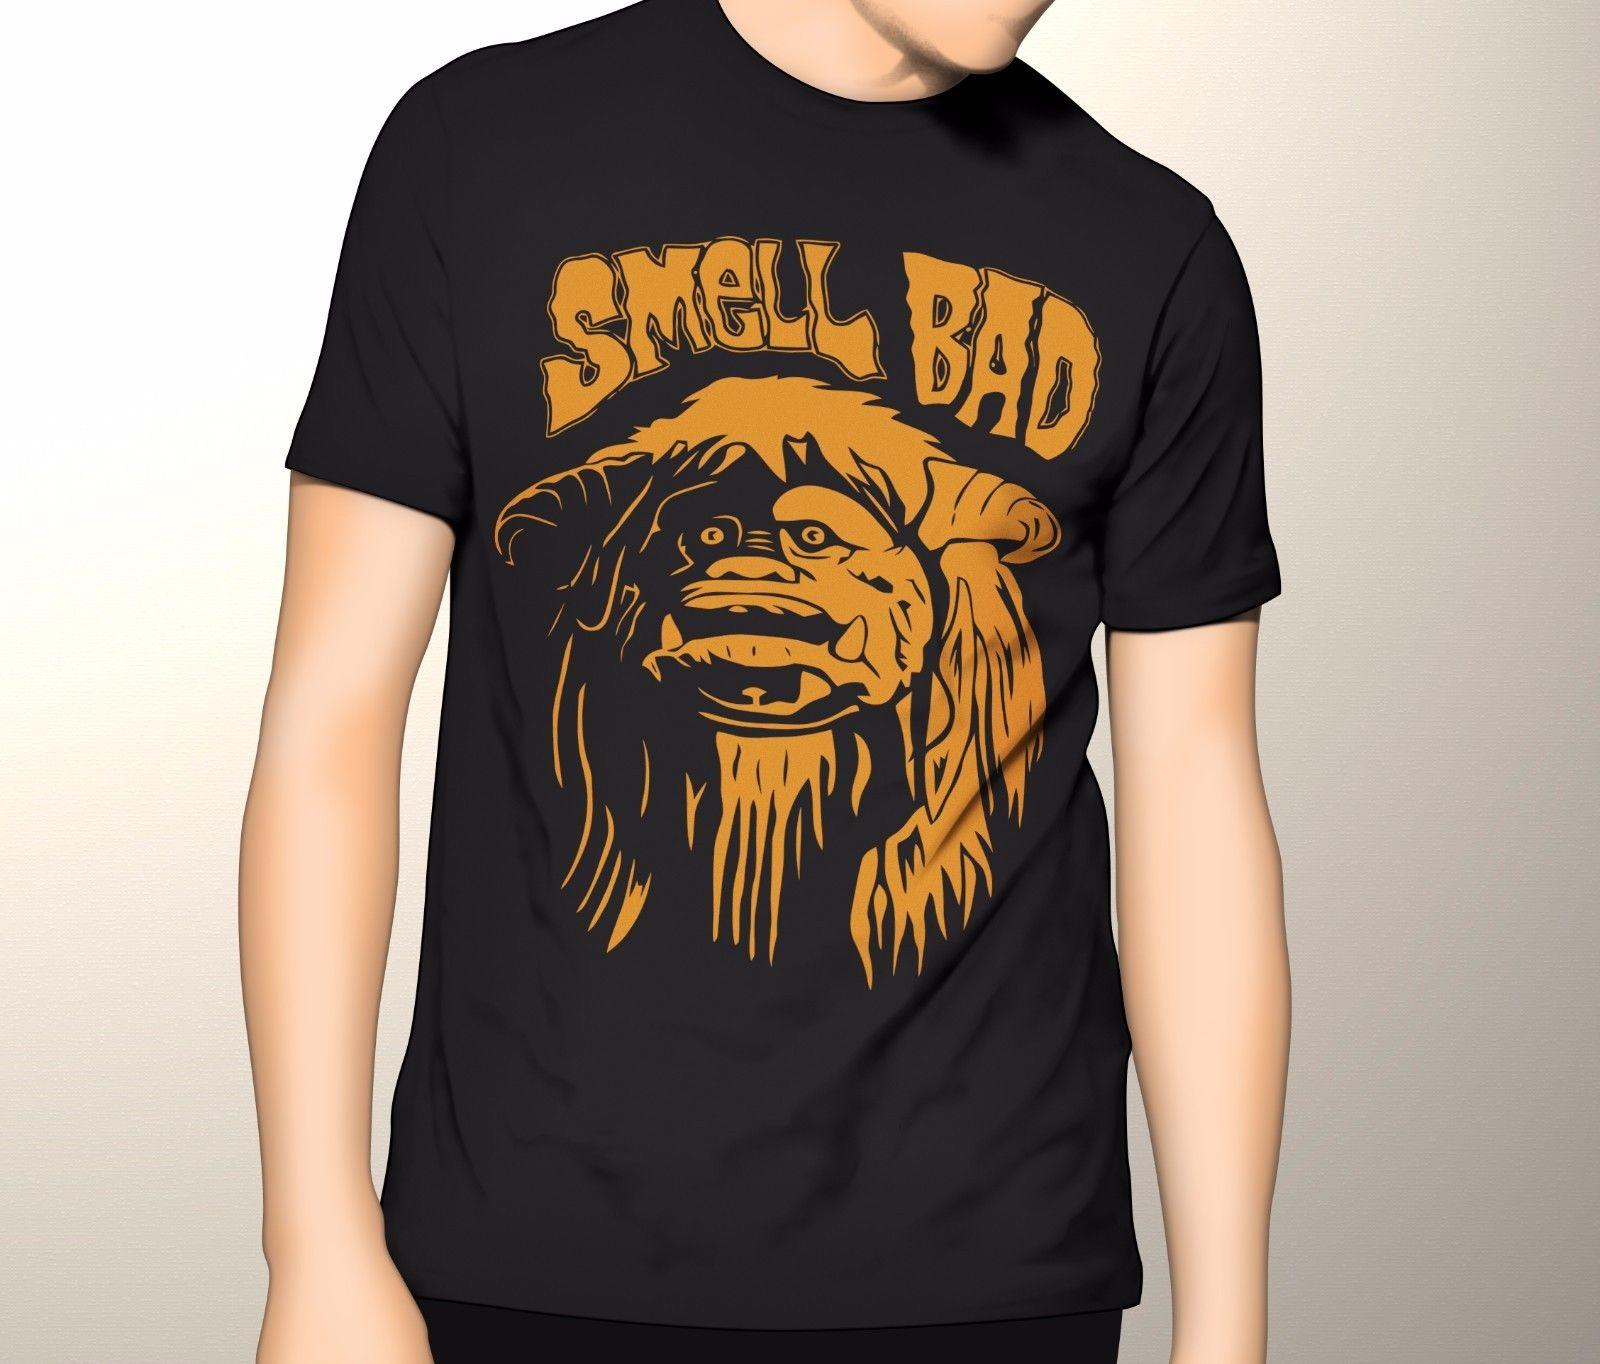 Labyrinth Shirt, Ludo Smell Bad Premium Graphic T-Shirt S-5XL